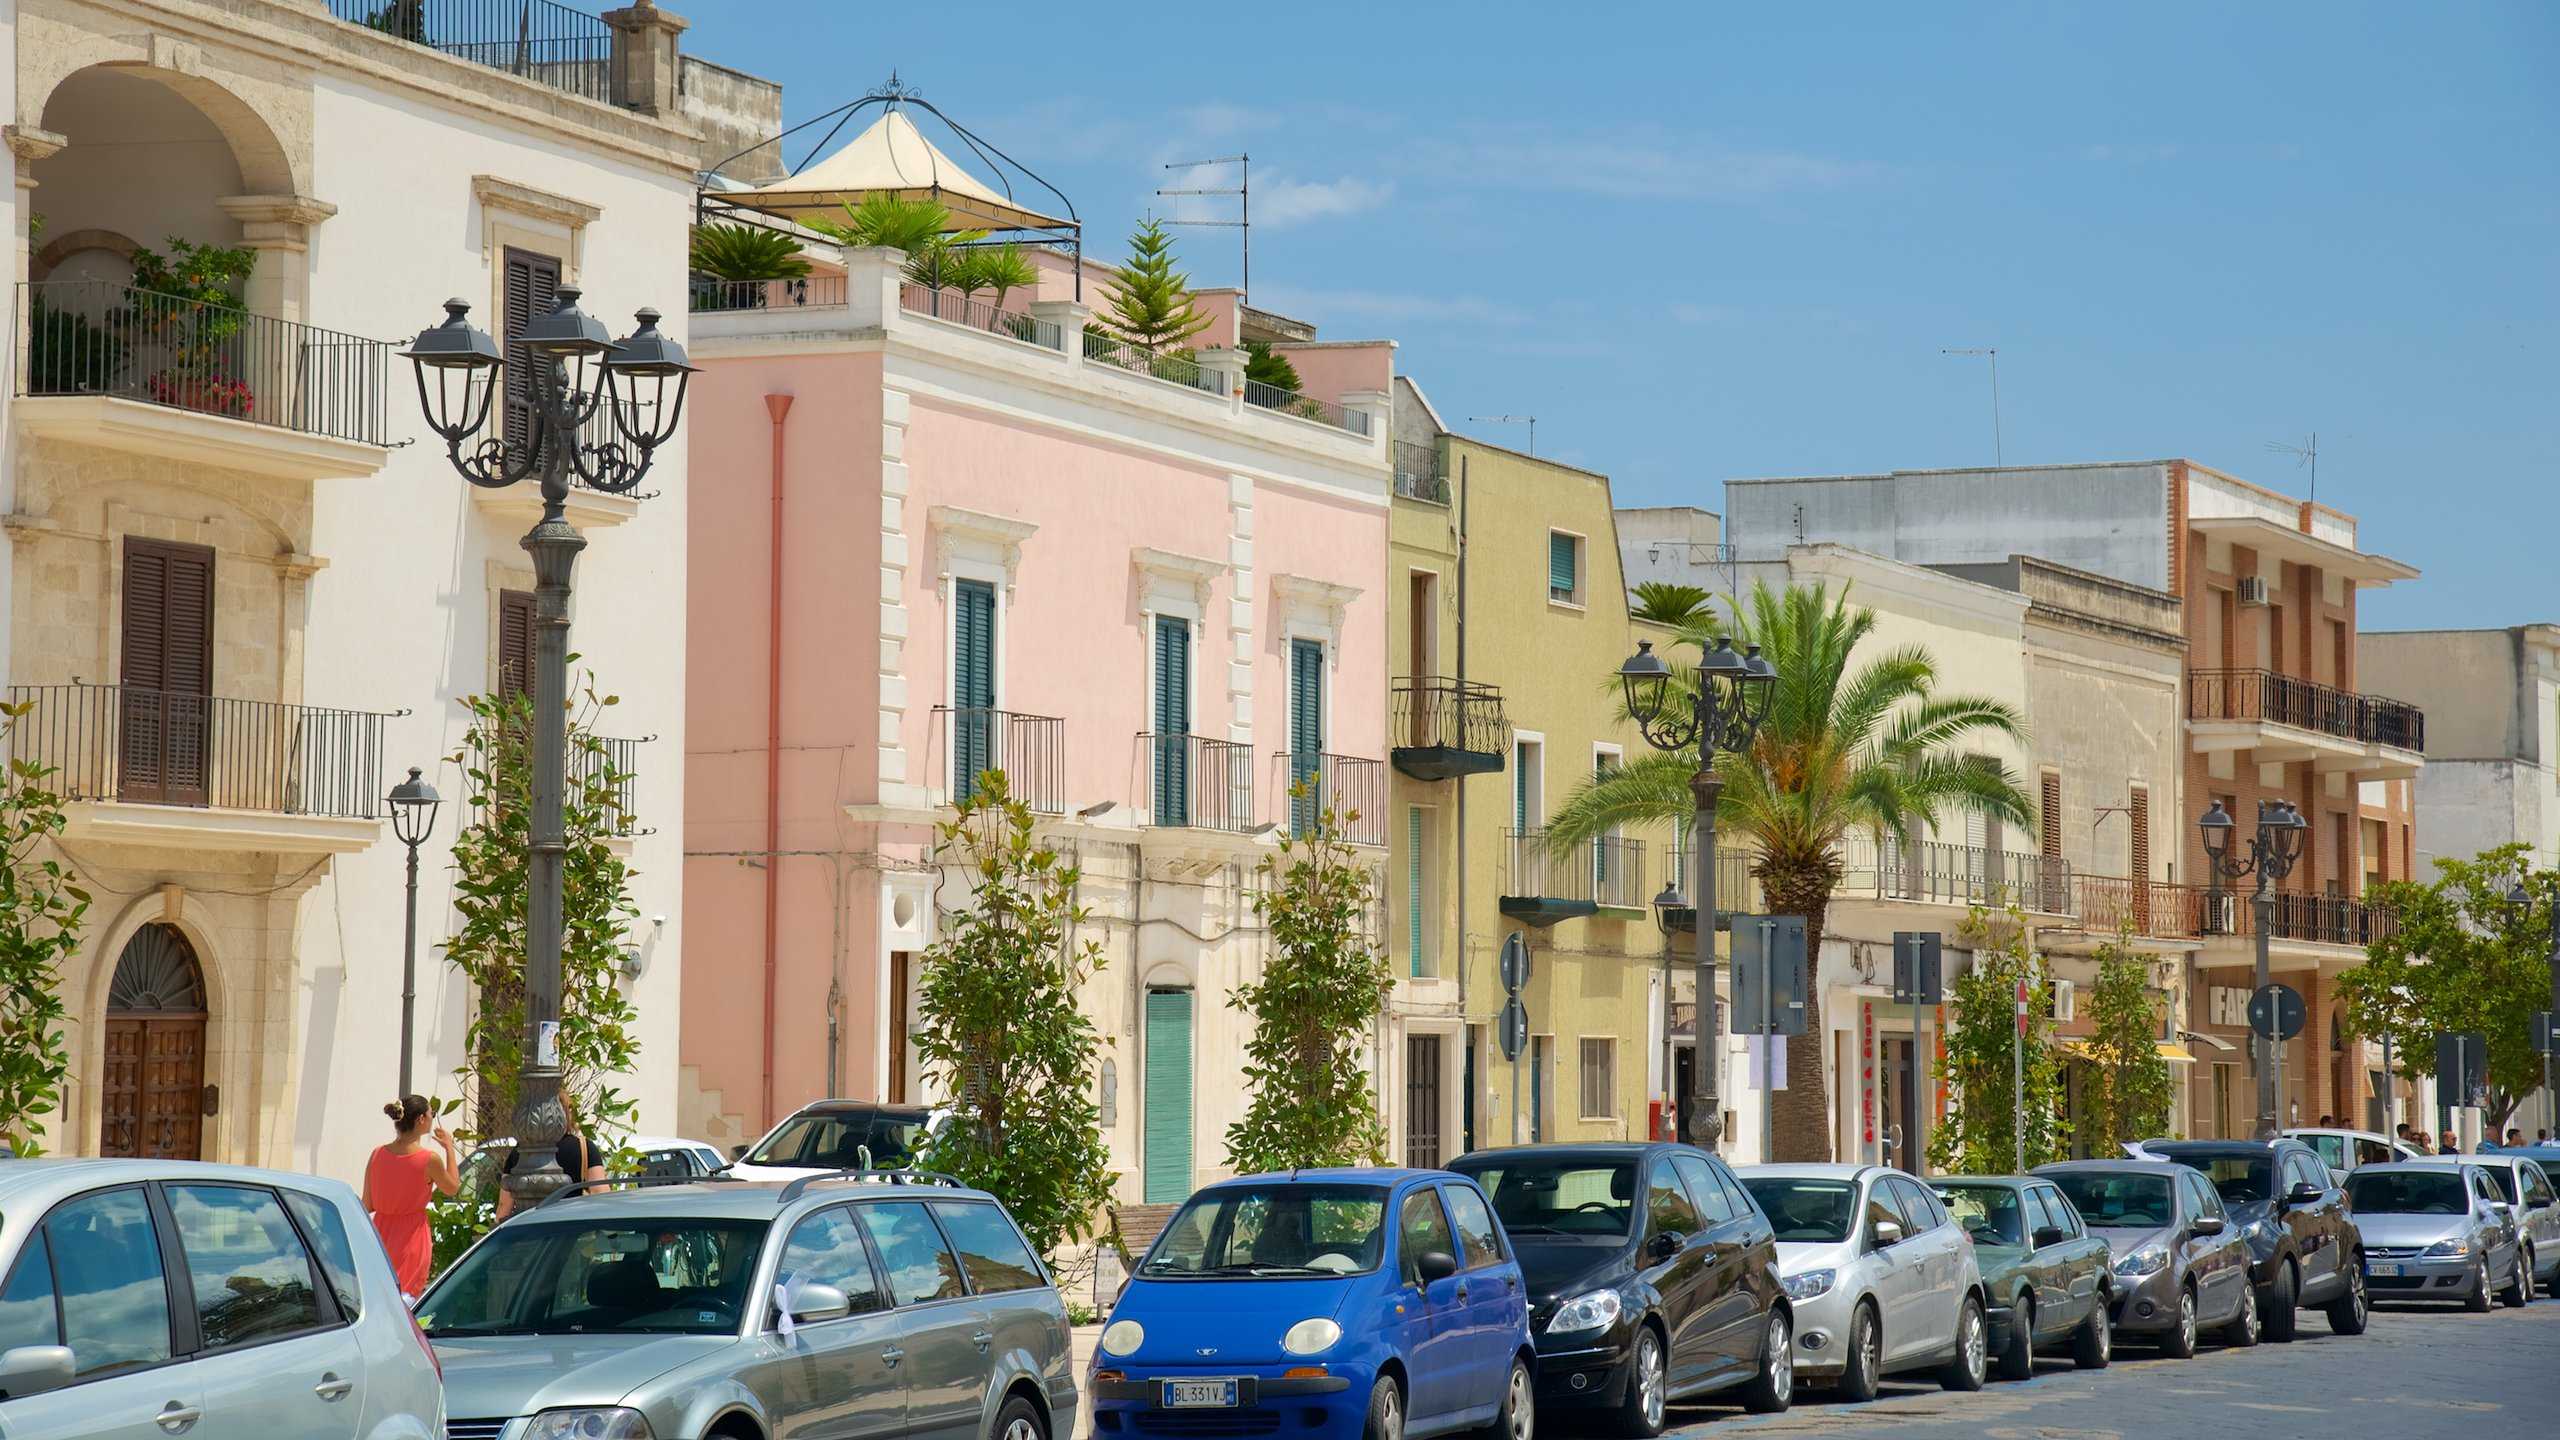 Manduria, Puglia, Italy